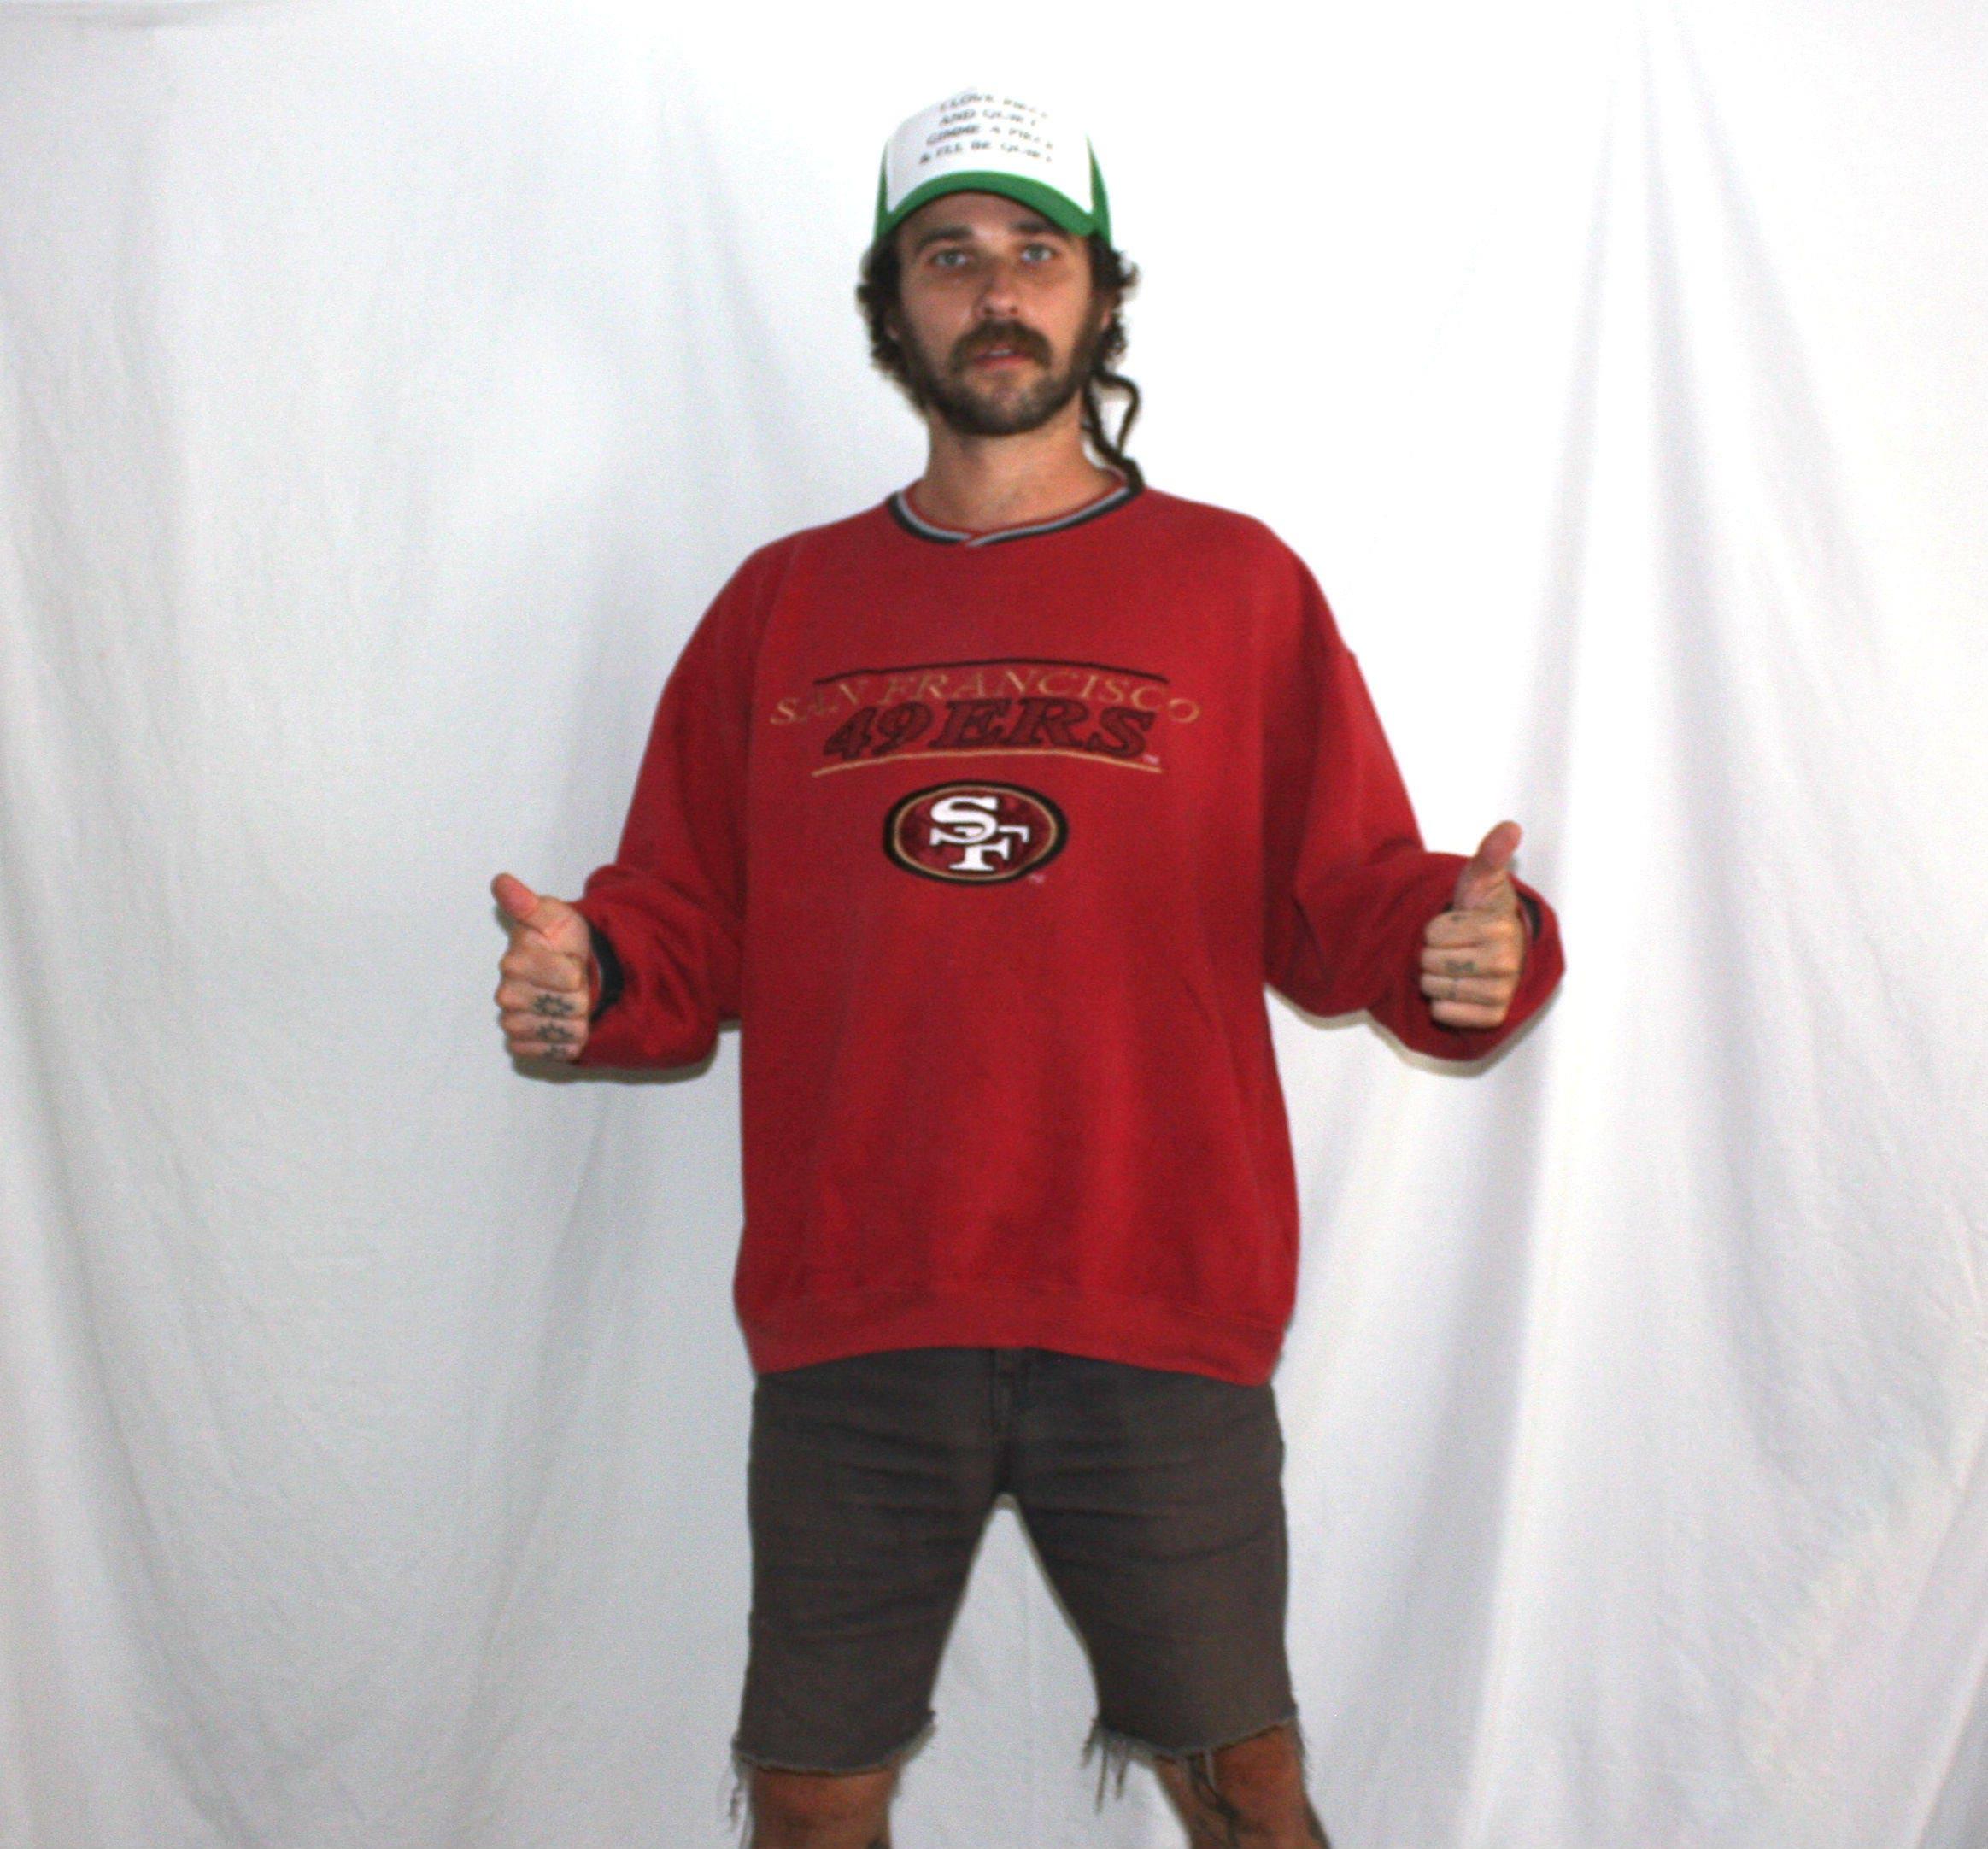 d61b09f38af San Francisco 49ers Vintage 90s Crewneck Sweatshirt. Retro Throwback NFL  Football Collectible Shirt. 2XL 90s Hip Hop NFL 49ers Joe Montana